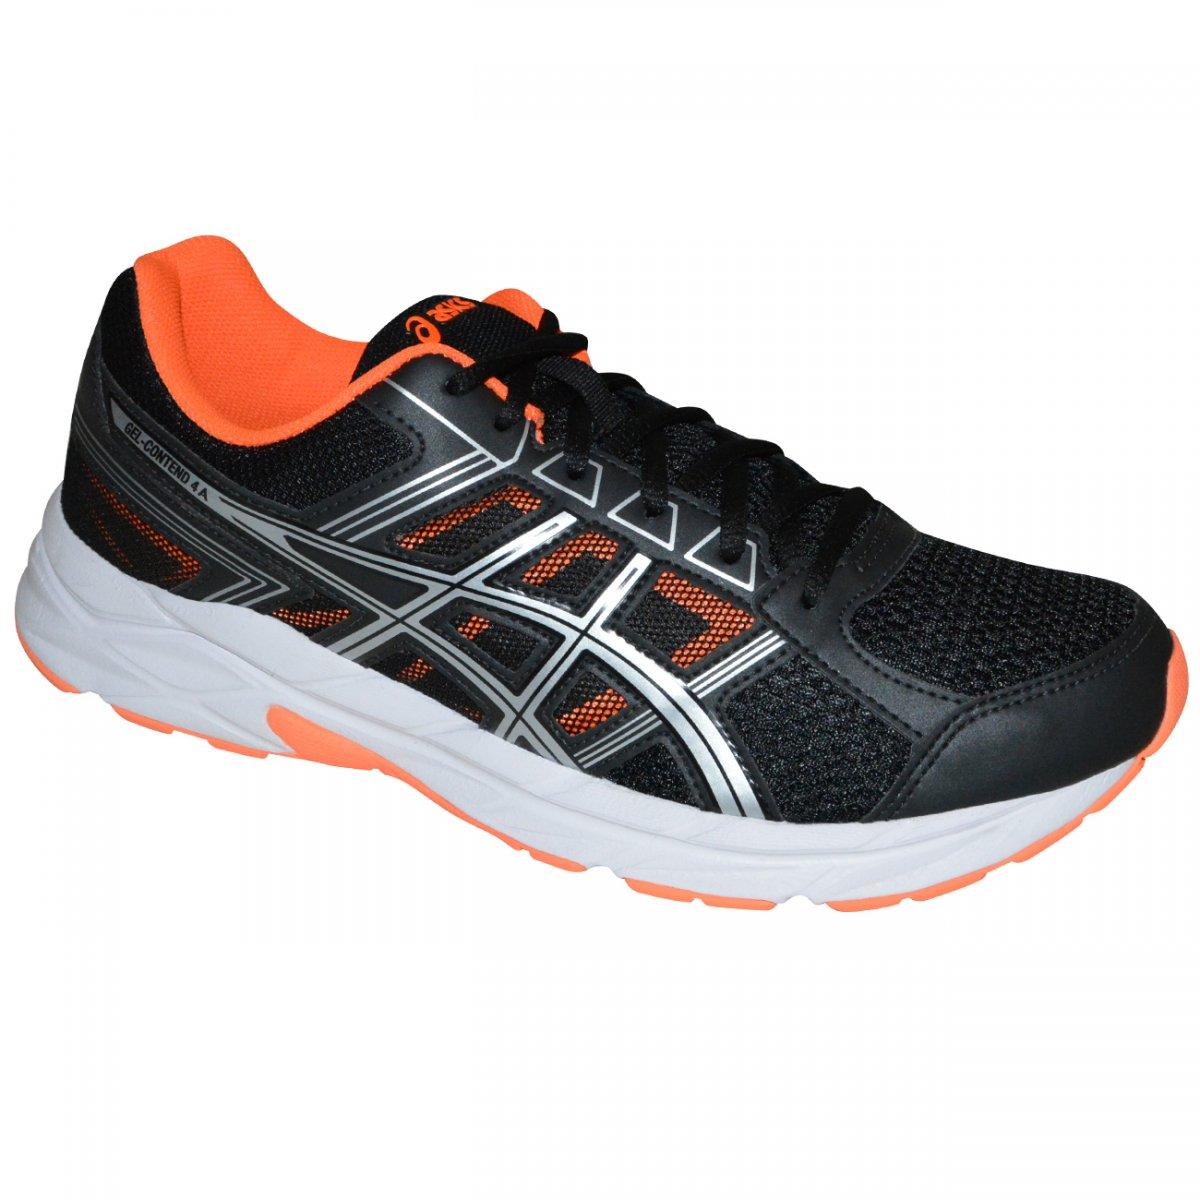 Tenis Asics Gel-contend 4 T026A 9092 - Preto prata laranja - Chuteira Nike 5f6181556afb5